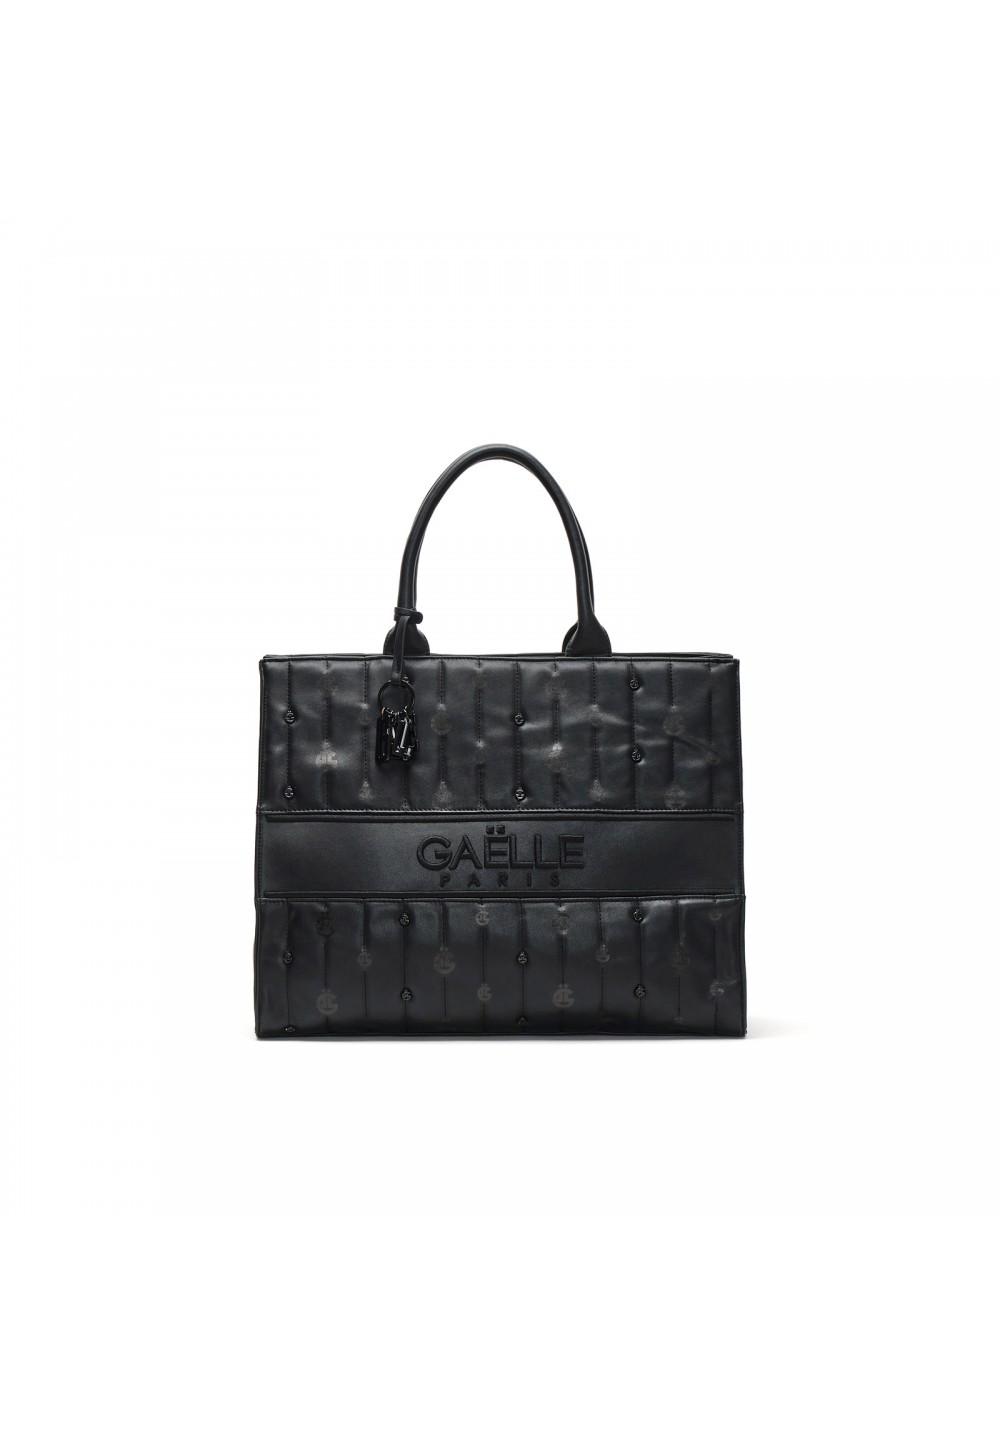 Maxi shopper con m icro logo GAELLE paris   GBDA2737NERO